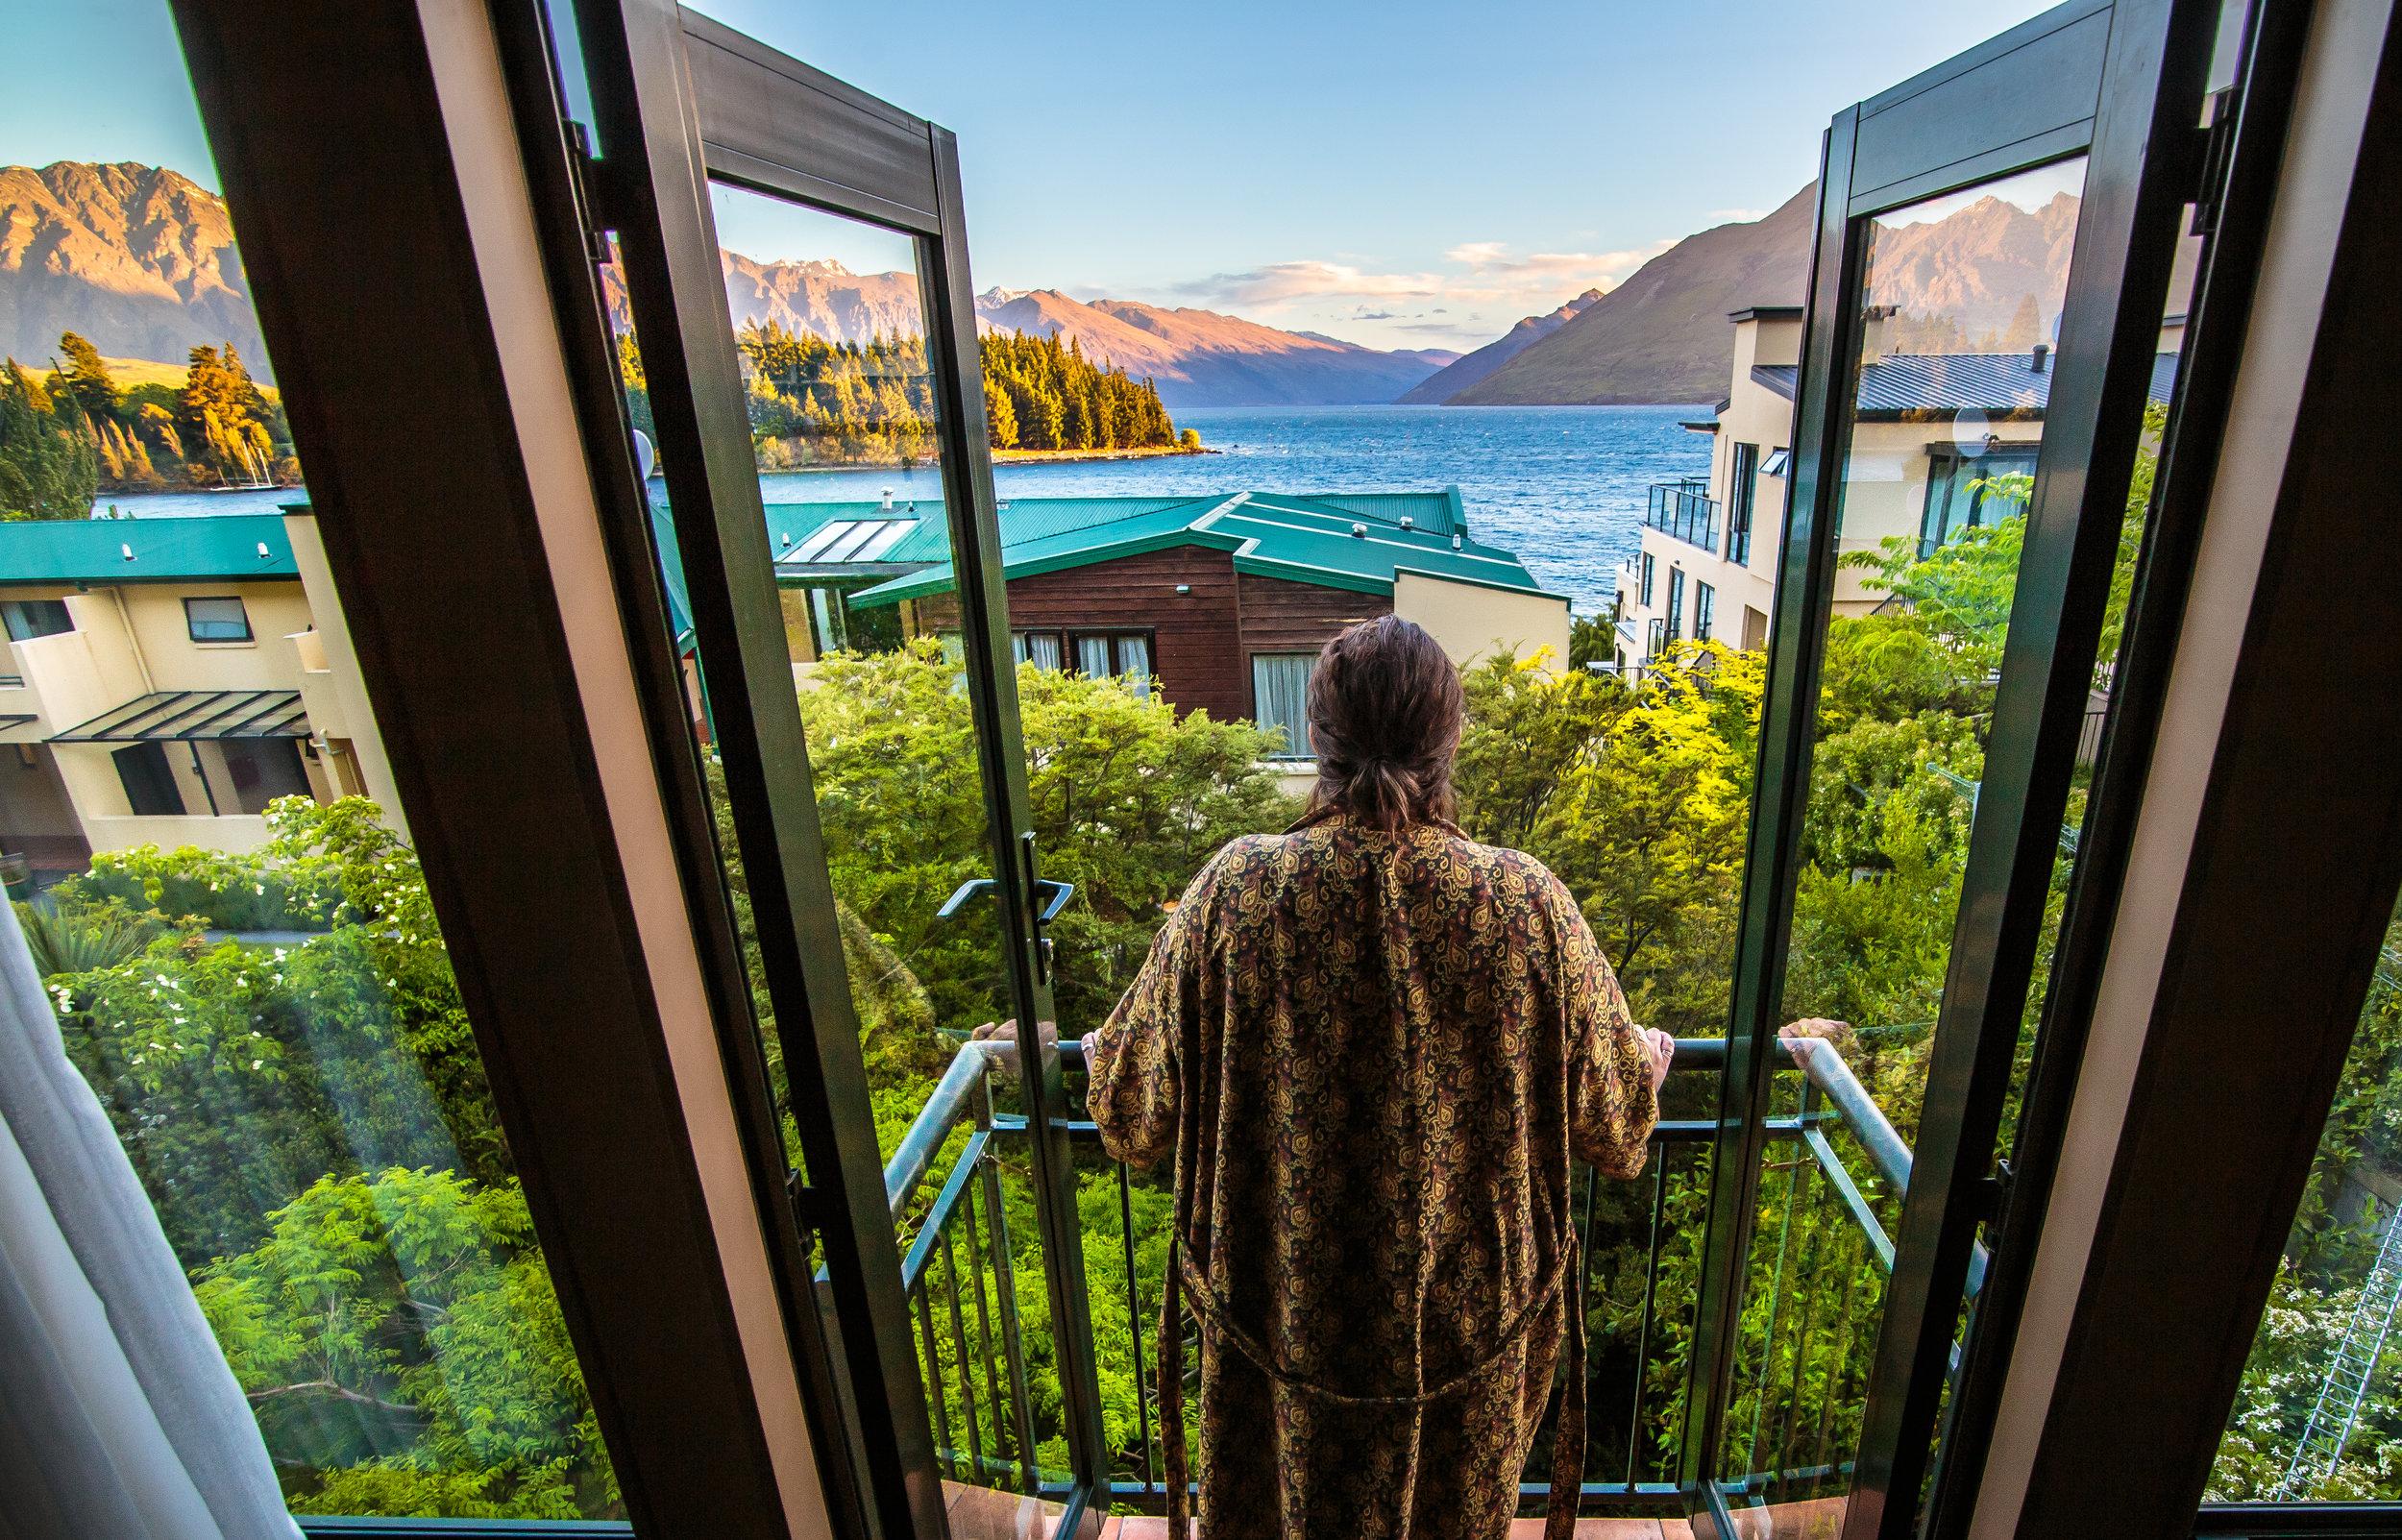 The view from the balcony of Lake Wakatipu